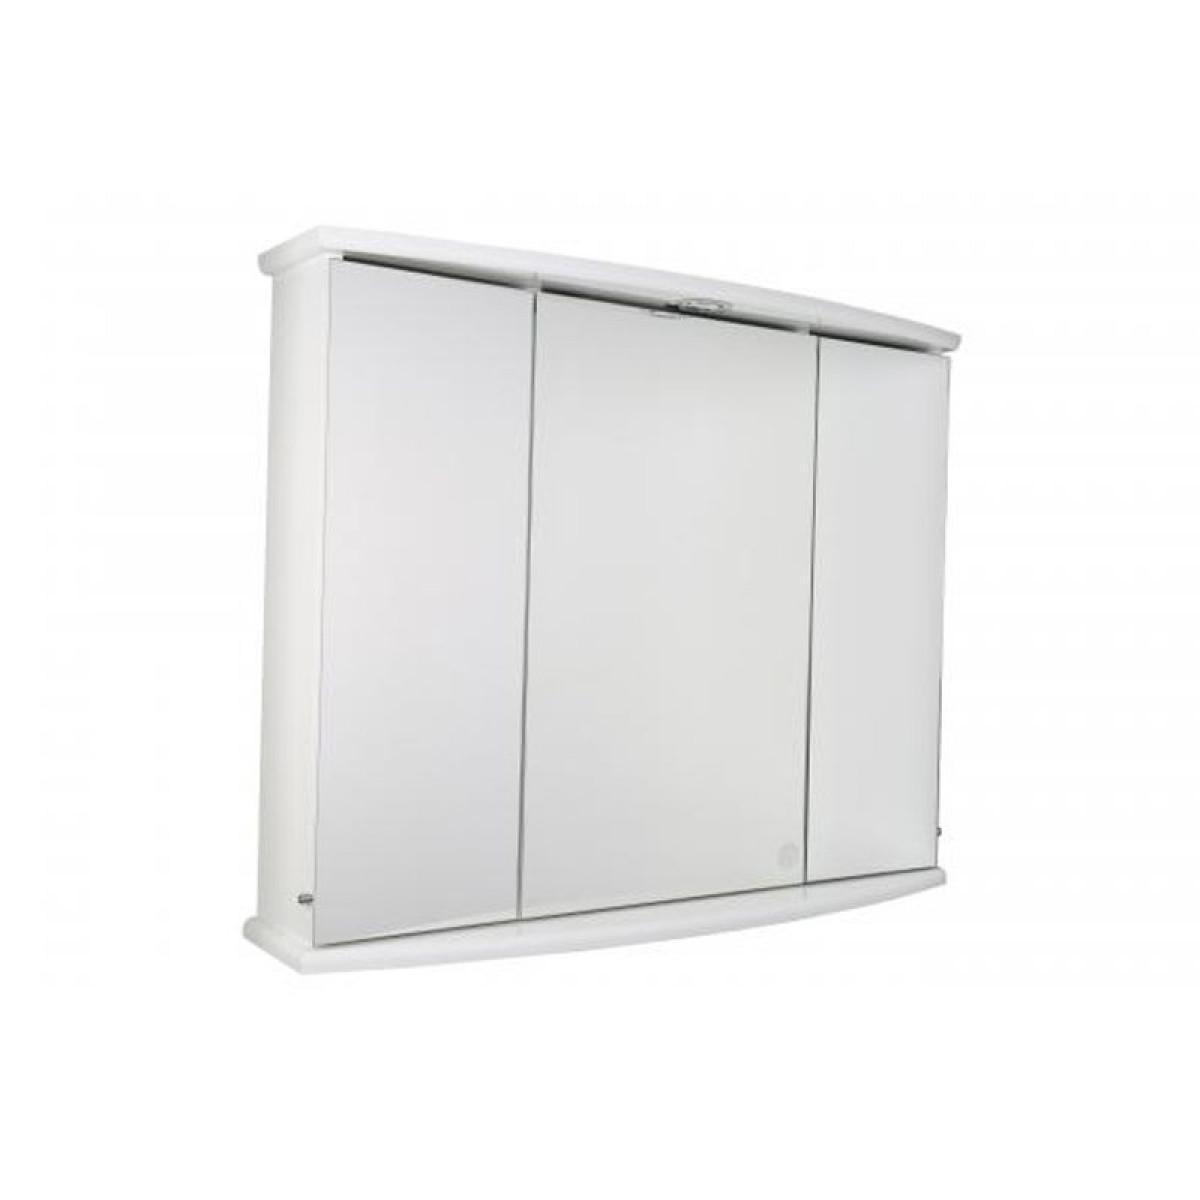 croydex ashstead tri view illuminated cabinet wc146222e